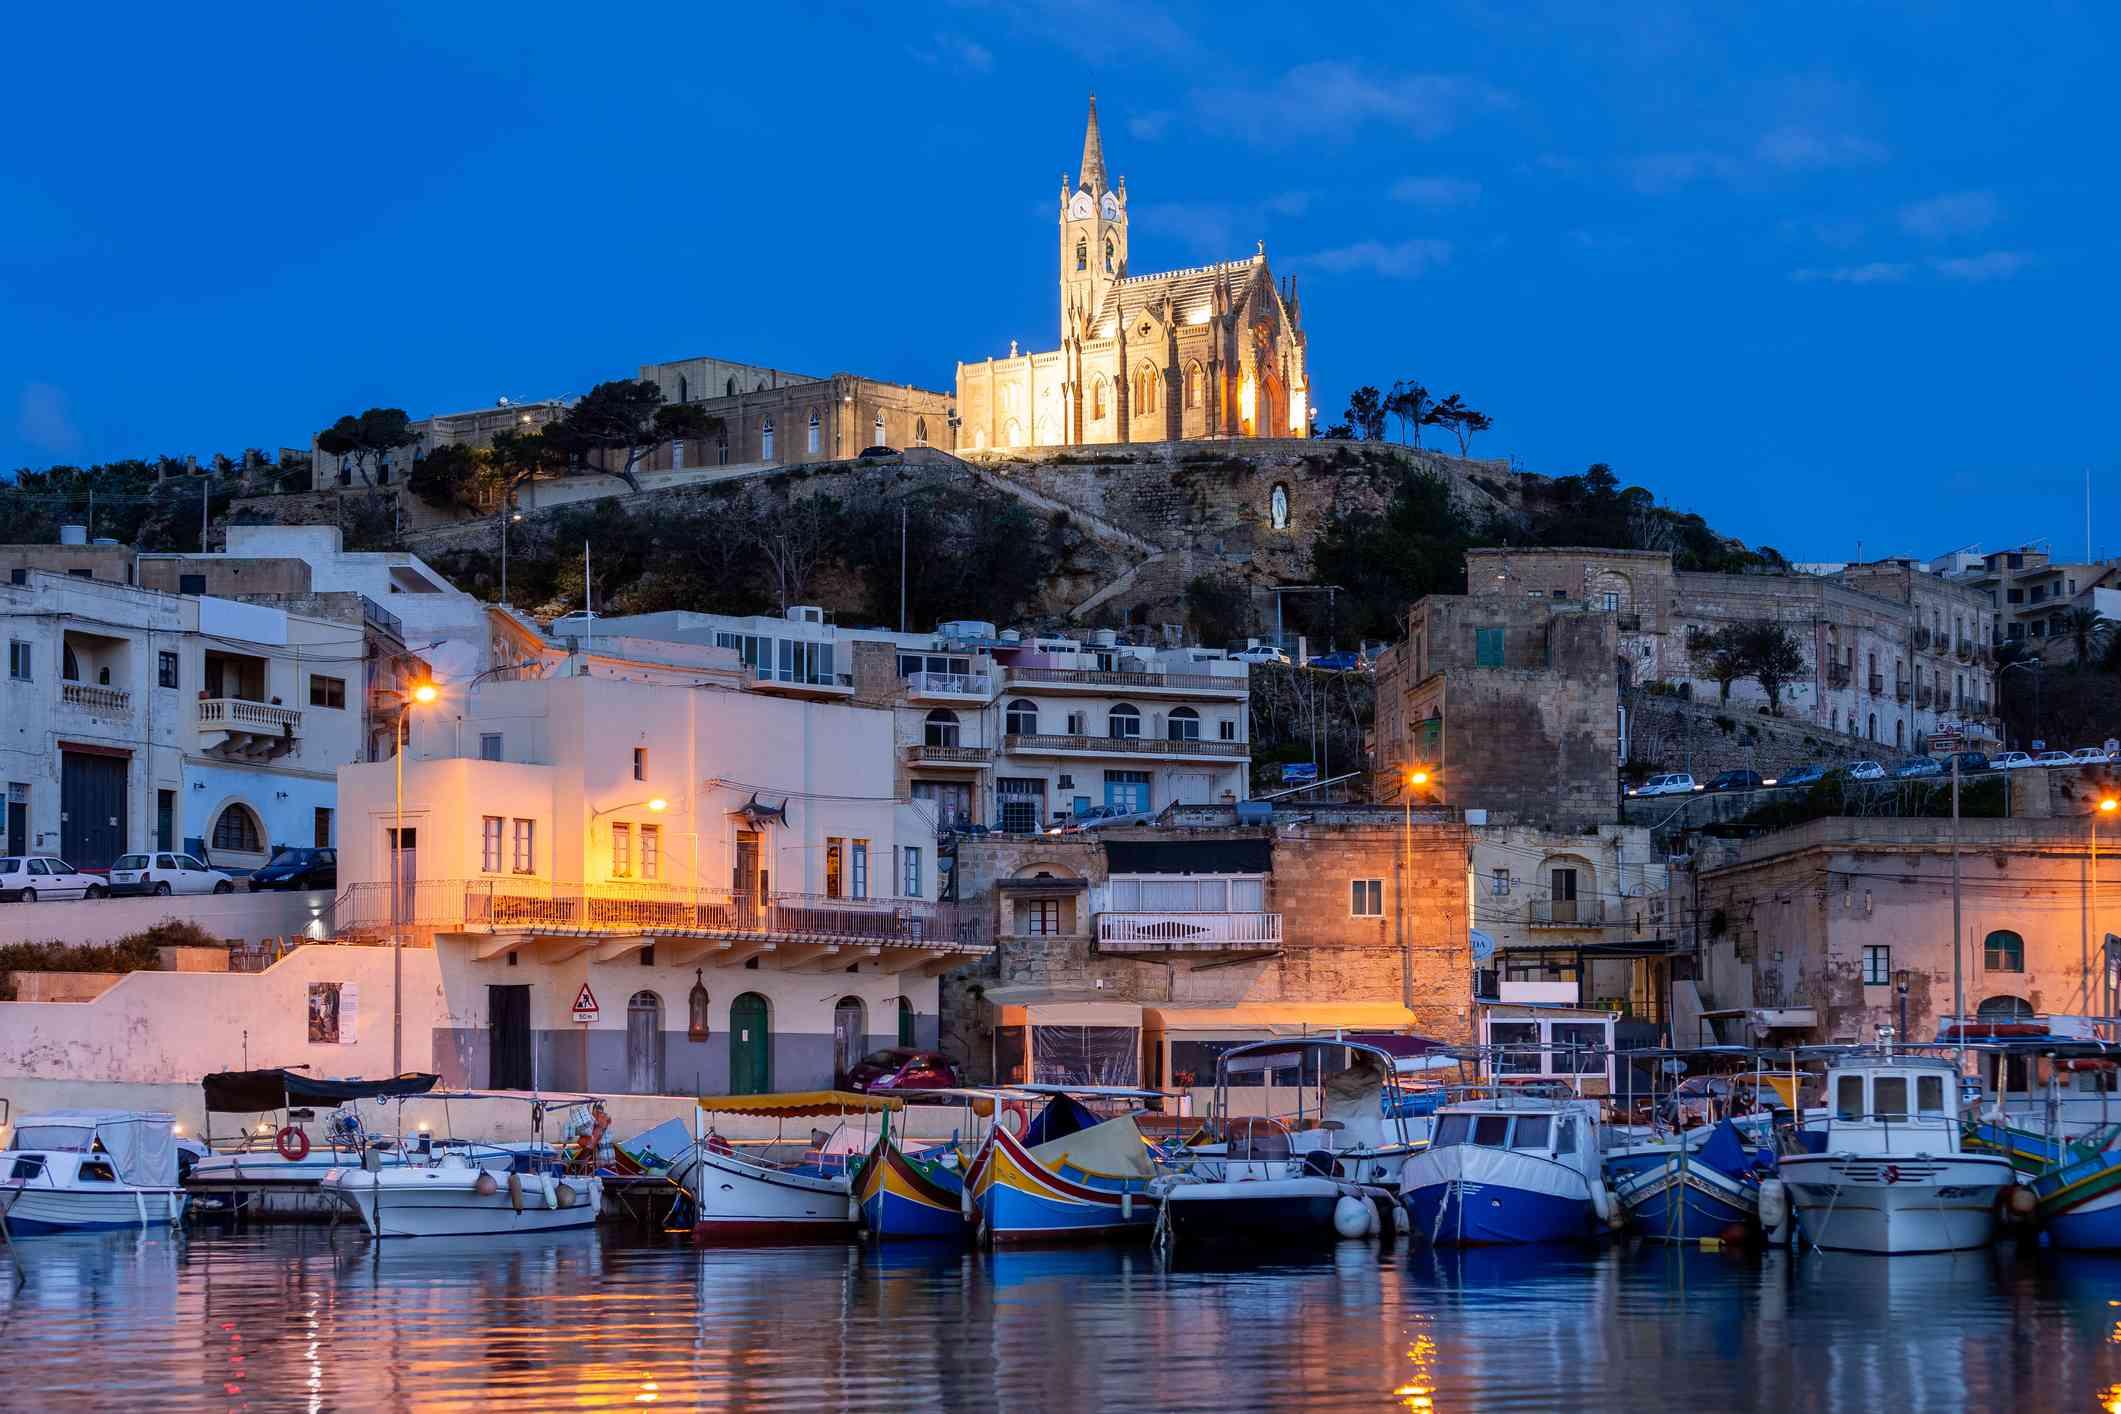 Lourdes Chapel, Mgarr, Gozo, Malta